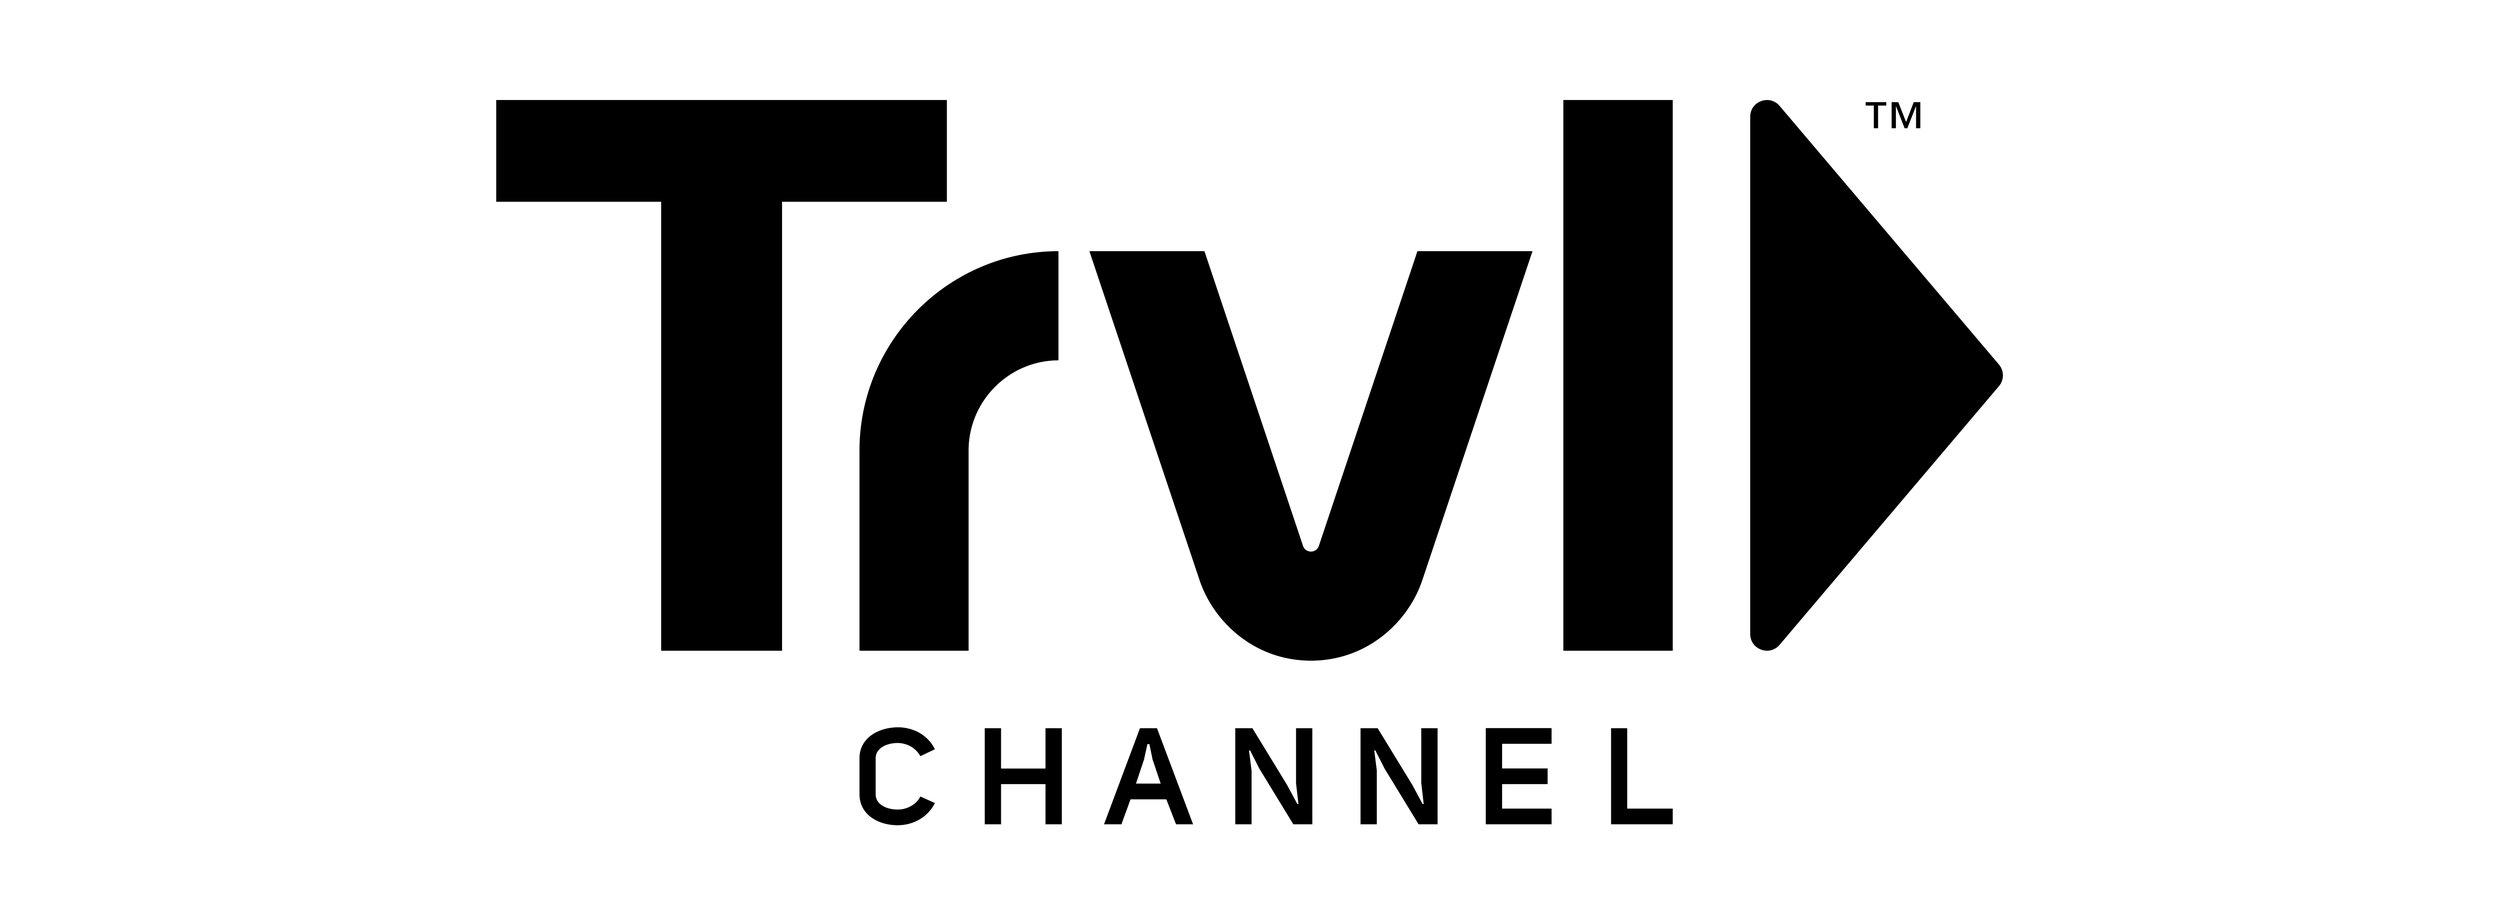 TRVL_Digital_B&W_HiRes.jpg